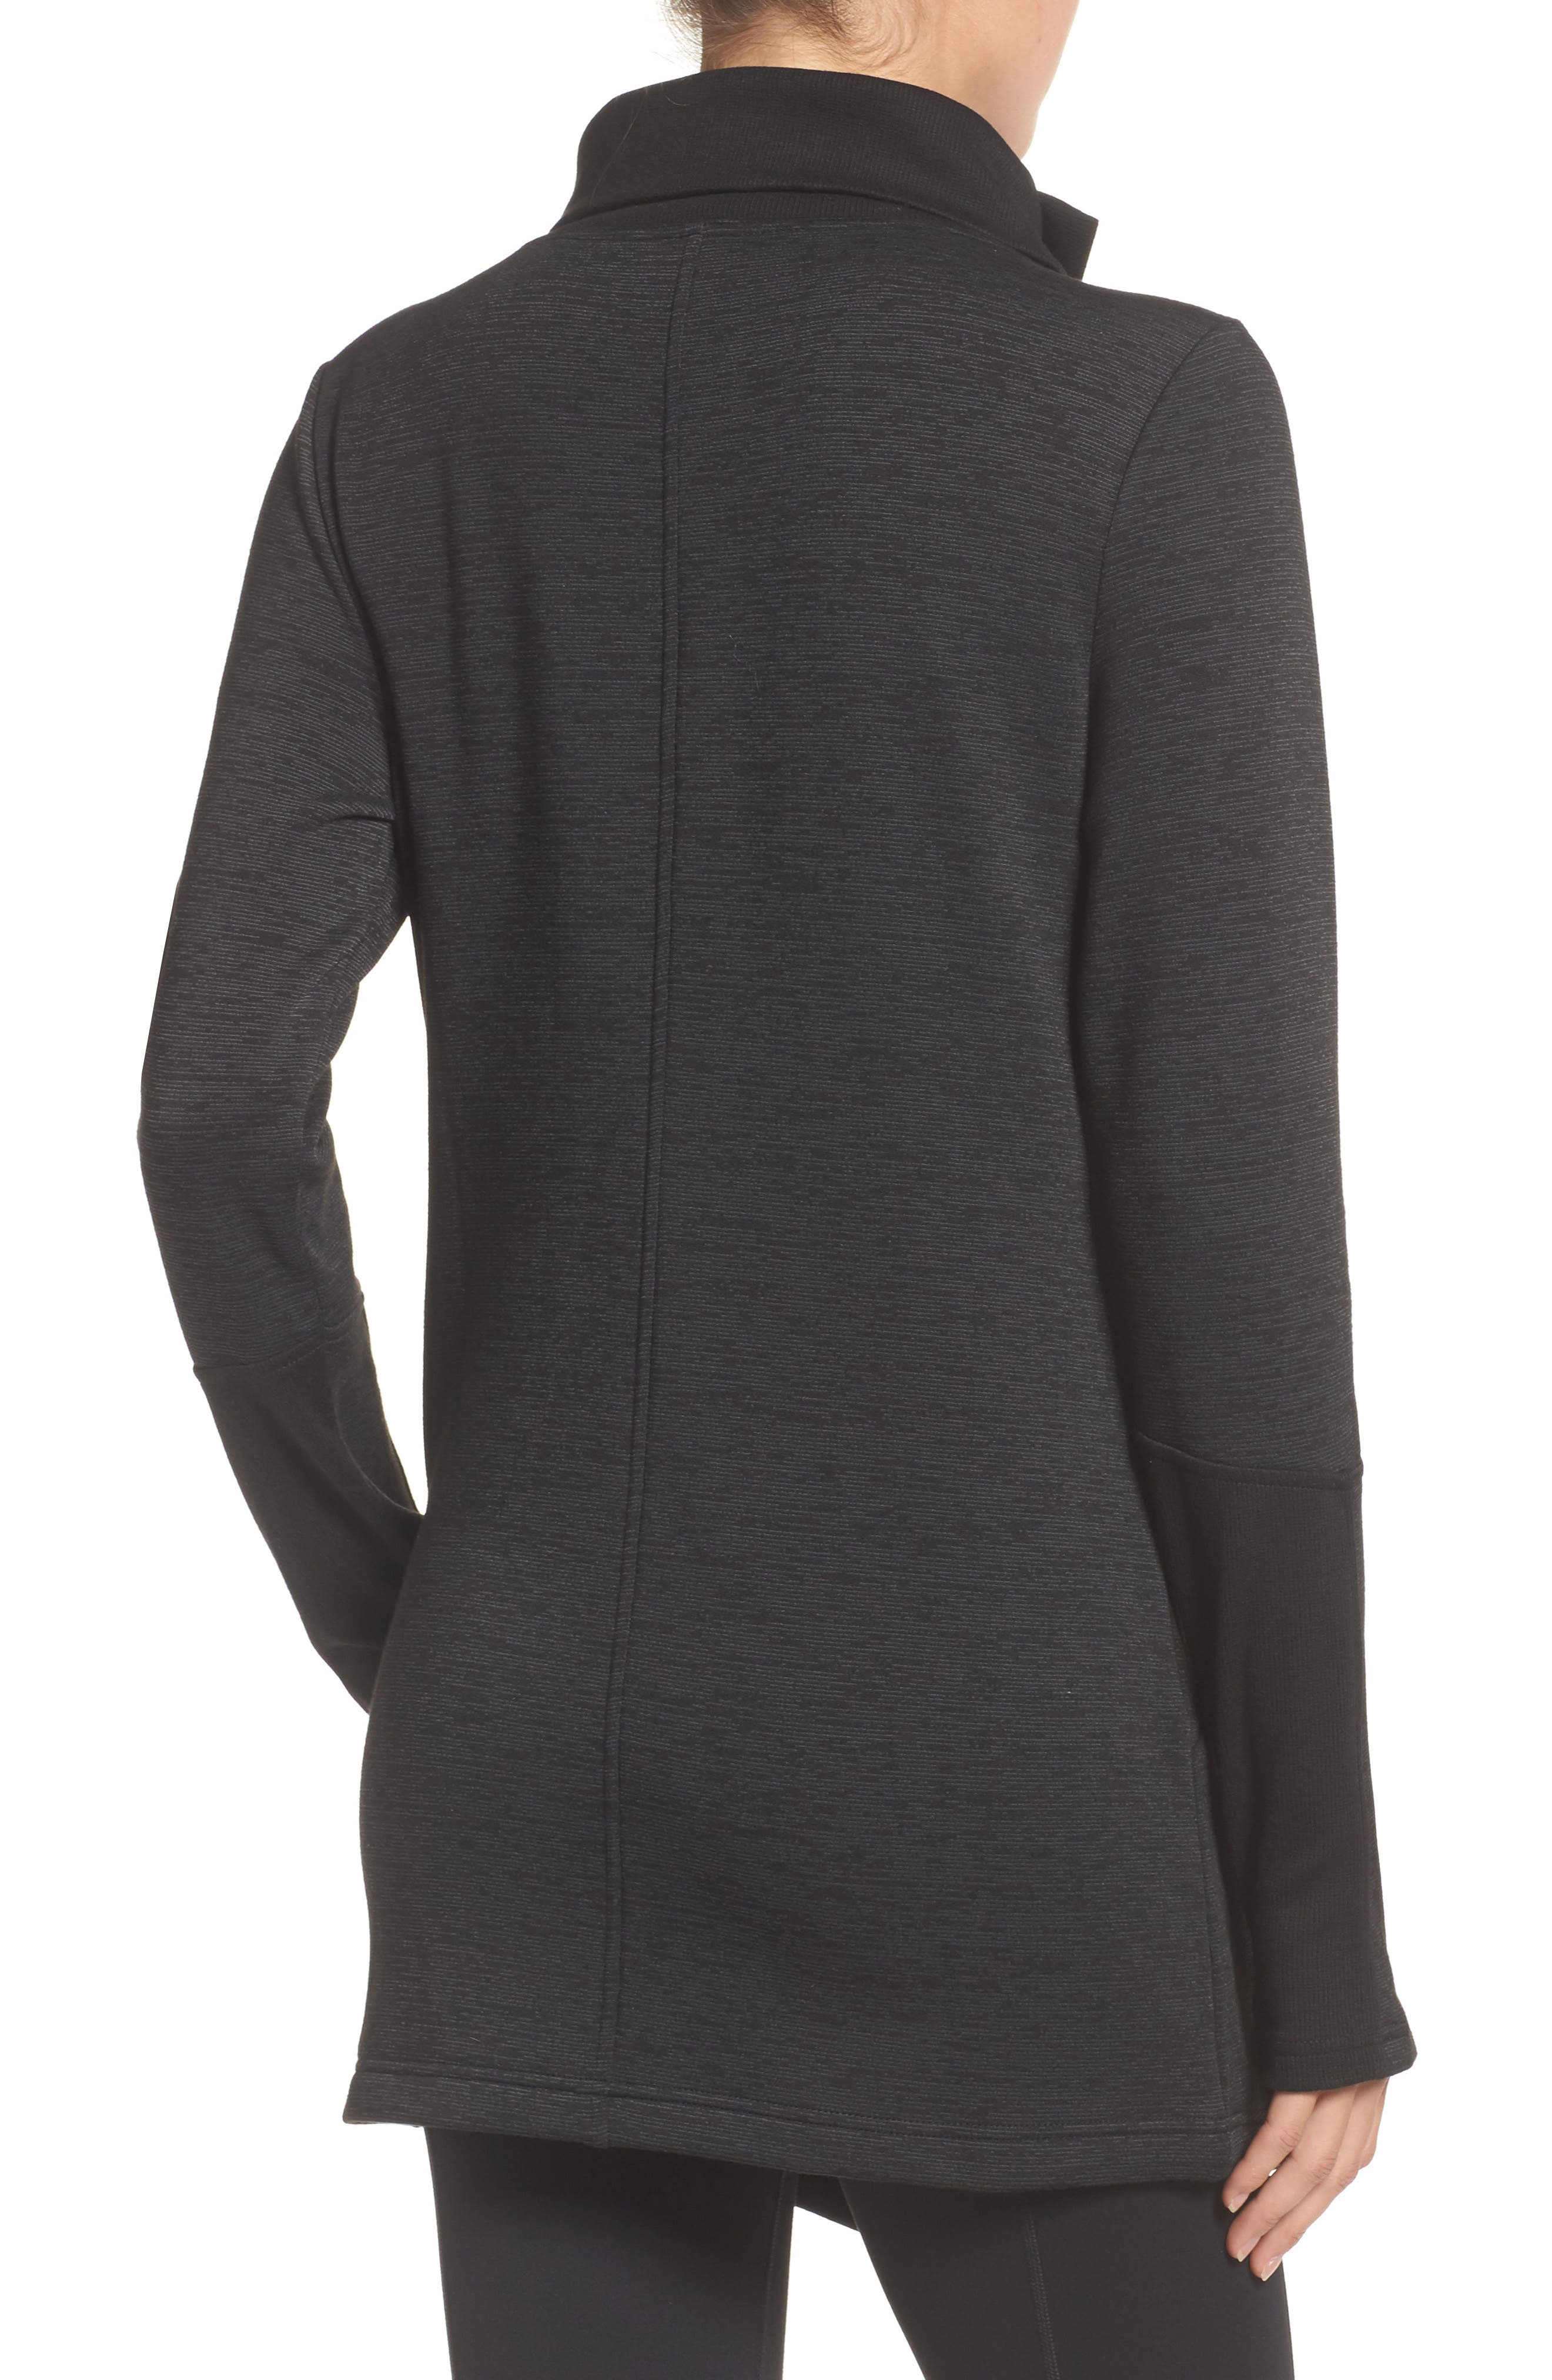 Elevate Me Wrap Sweatshirt,                             Alternate thumbnail 2, color,                             001